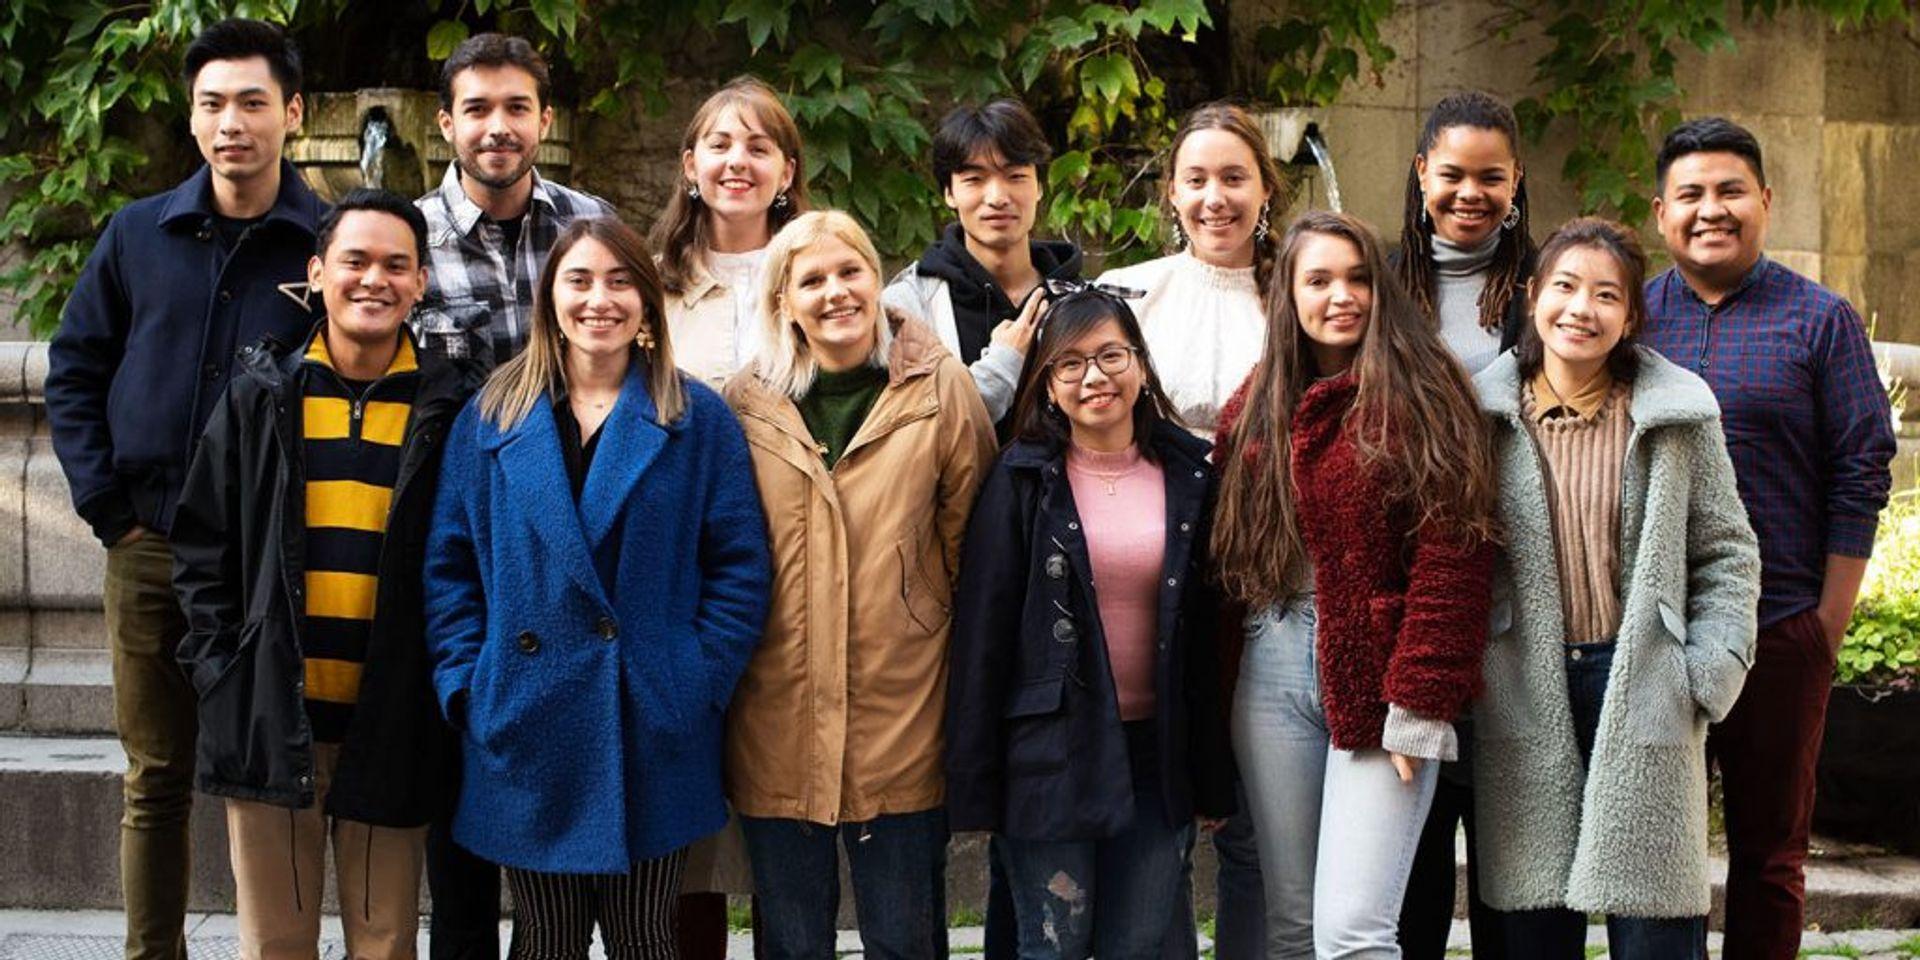 A group of Study in Sweden digital ambassadors